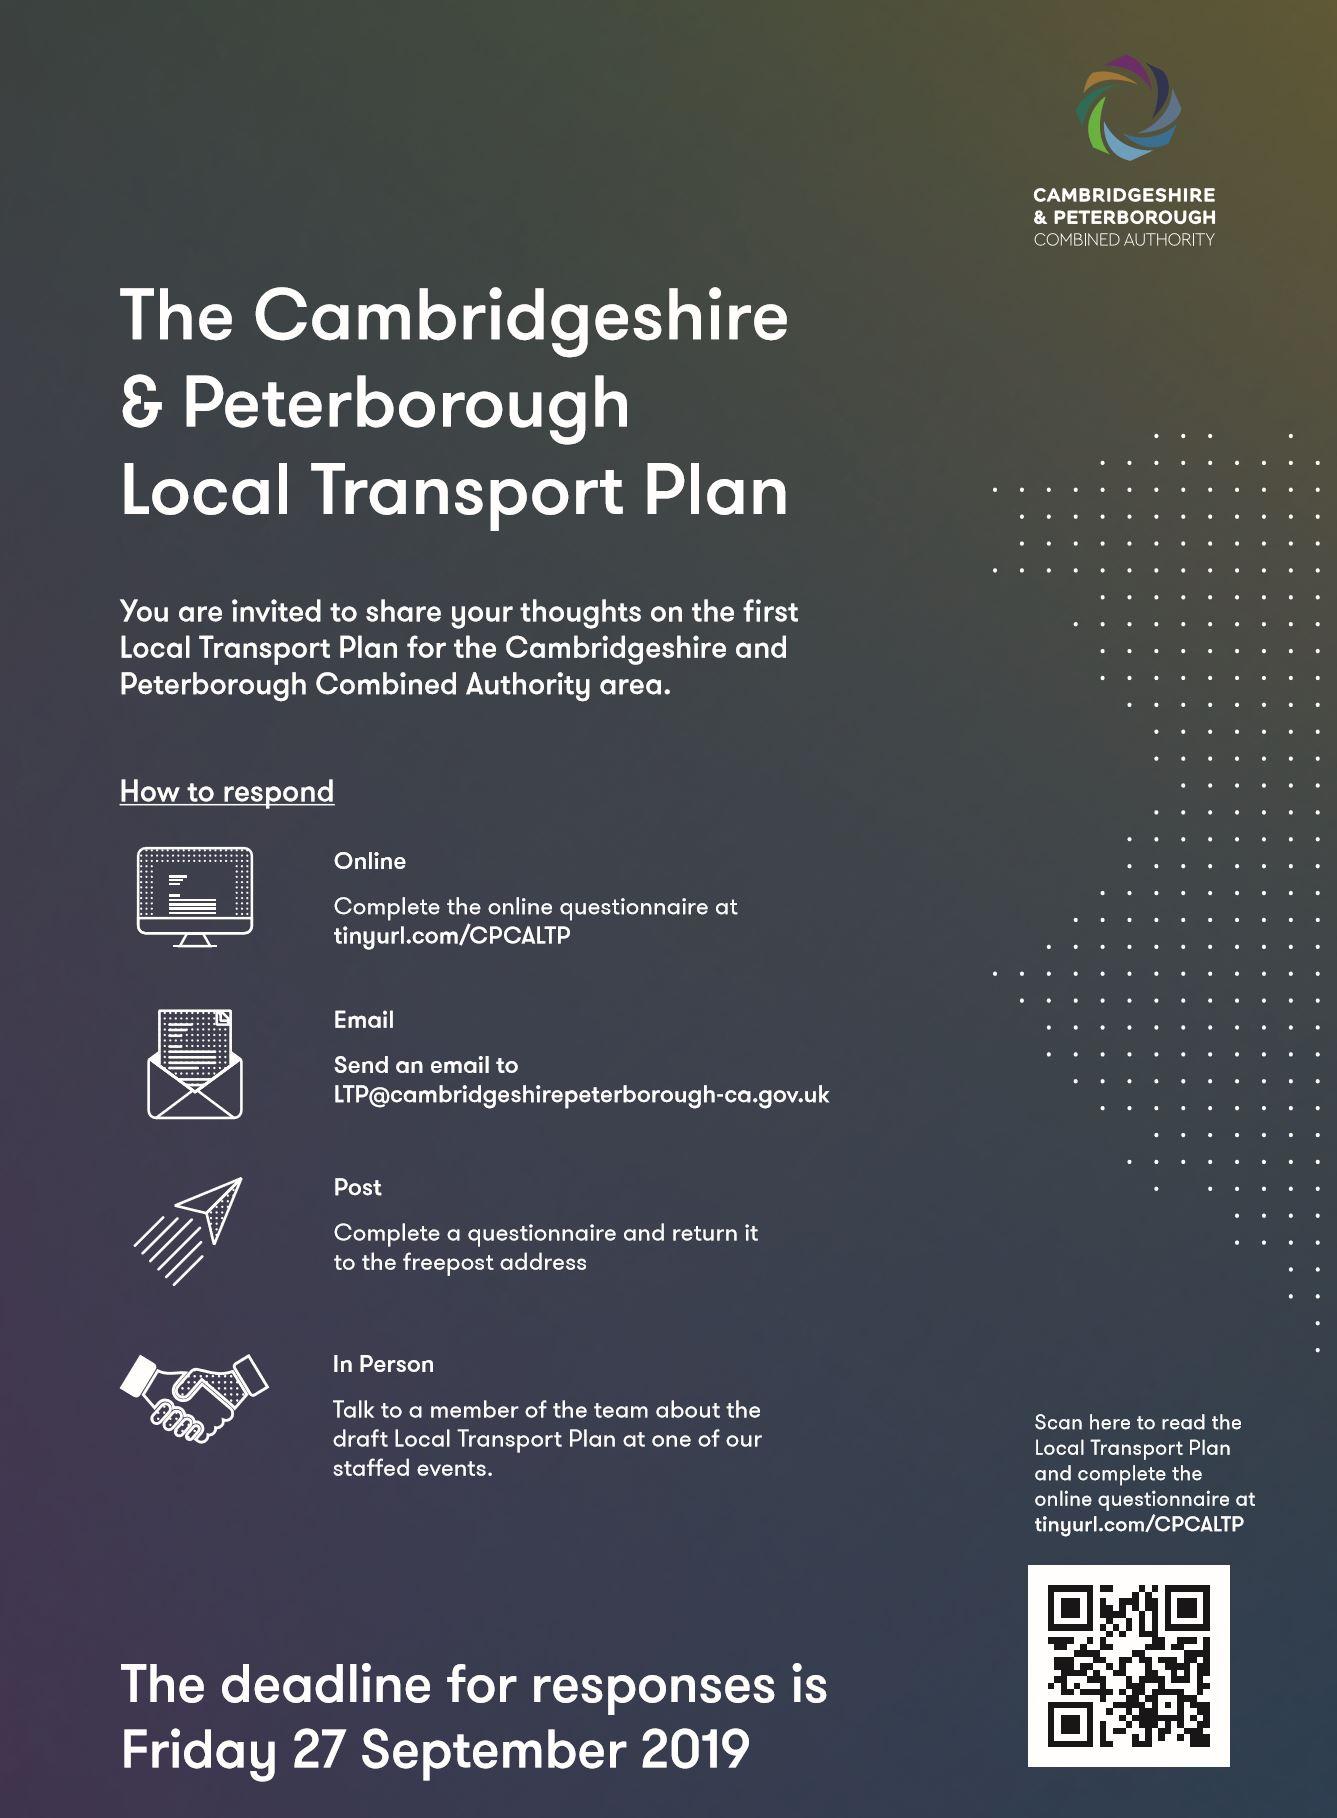 Exhibition – Local Transport Plan « Cottenham Community Centre